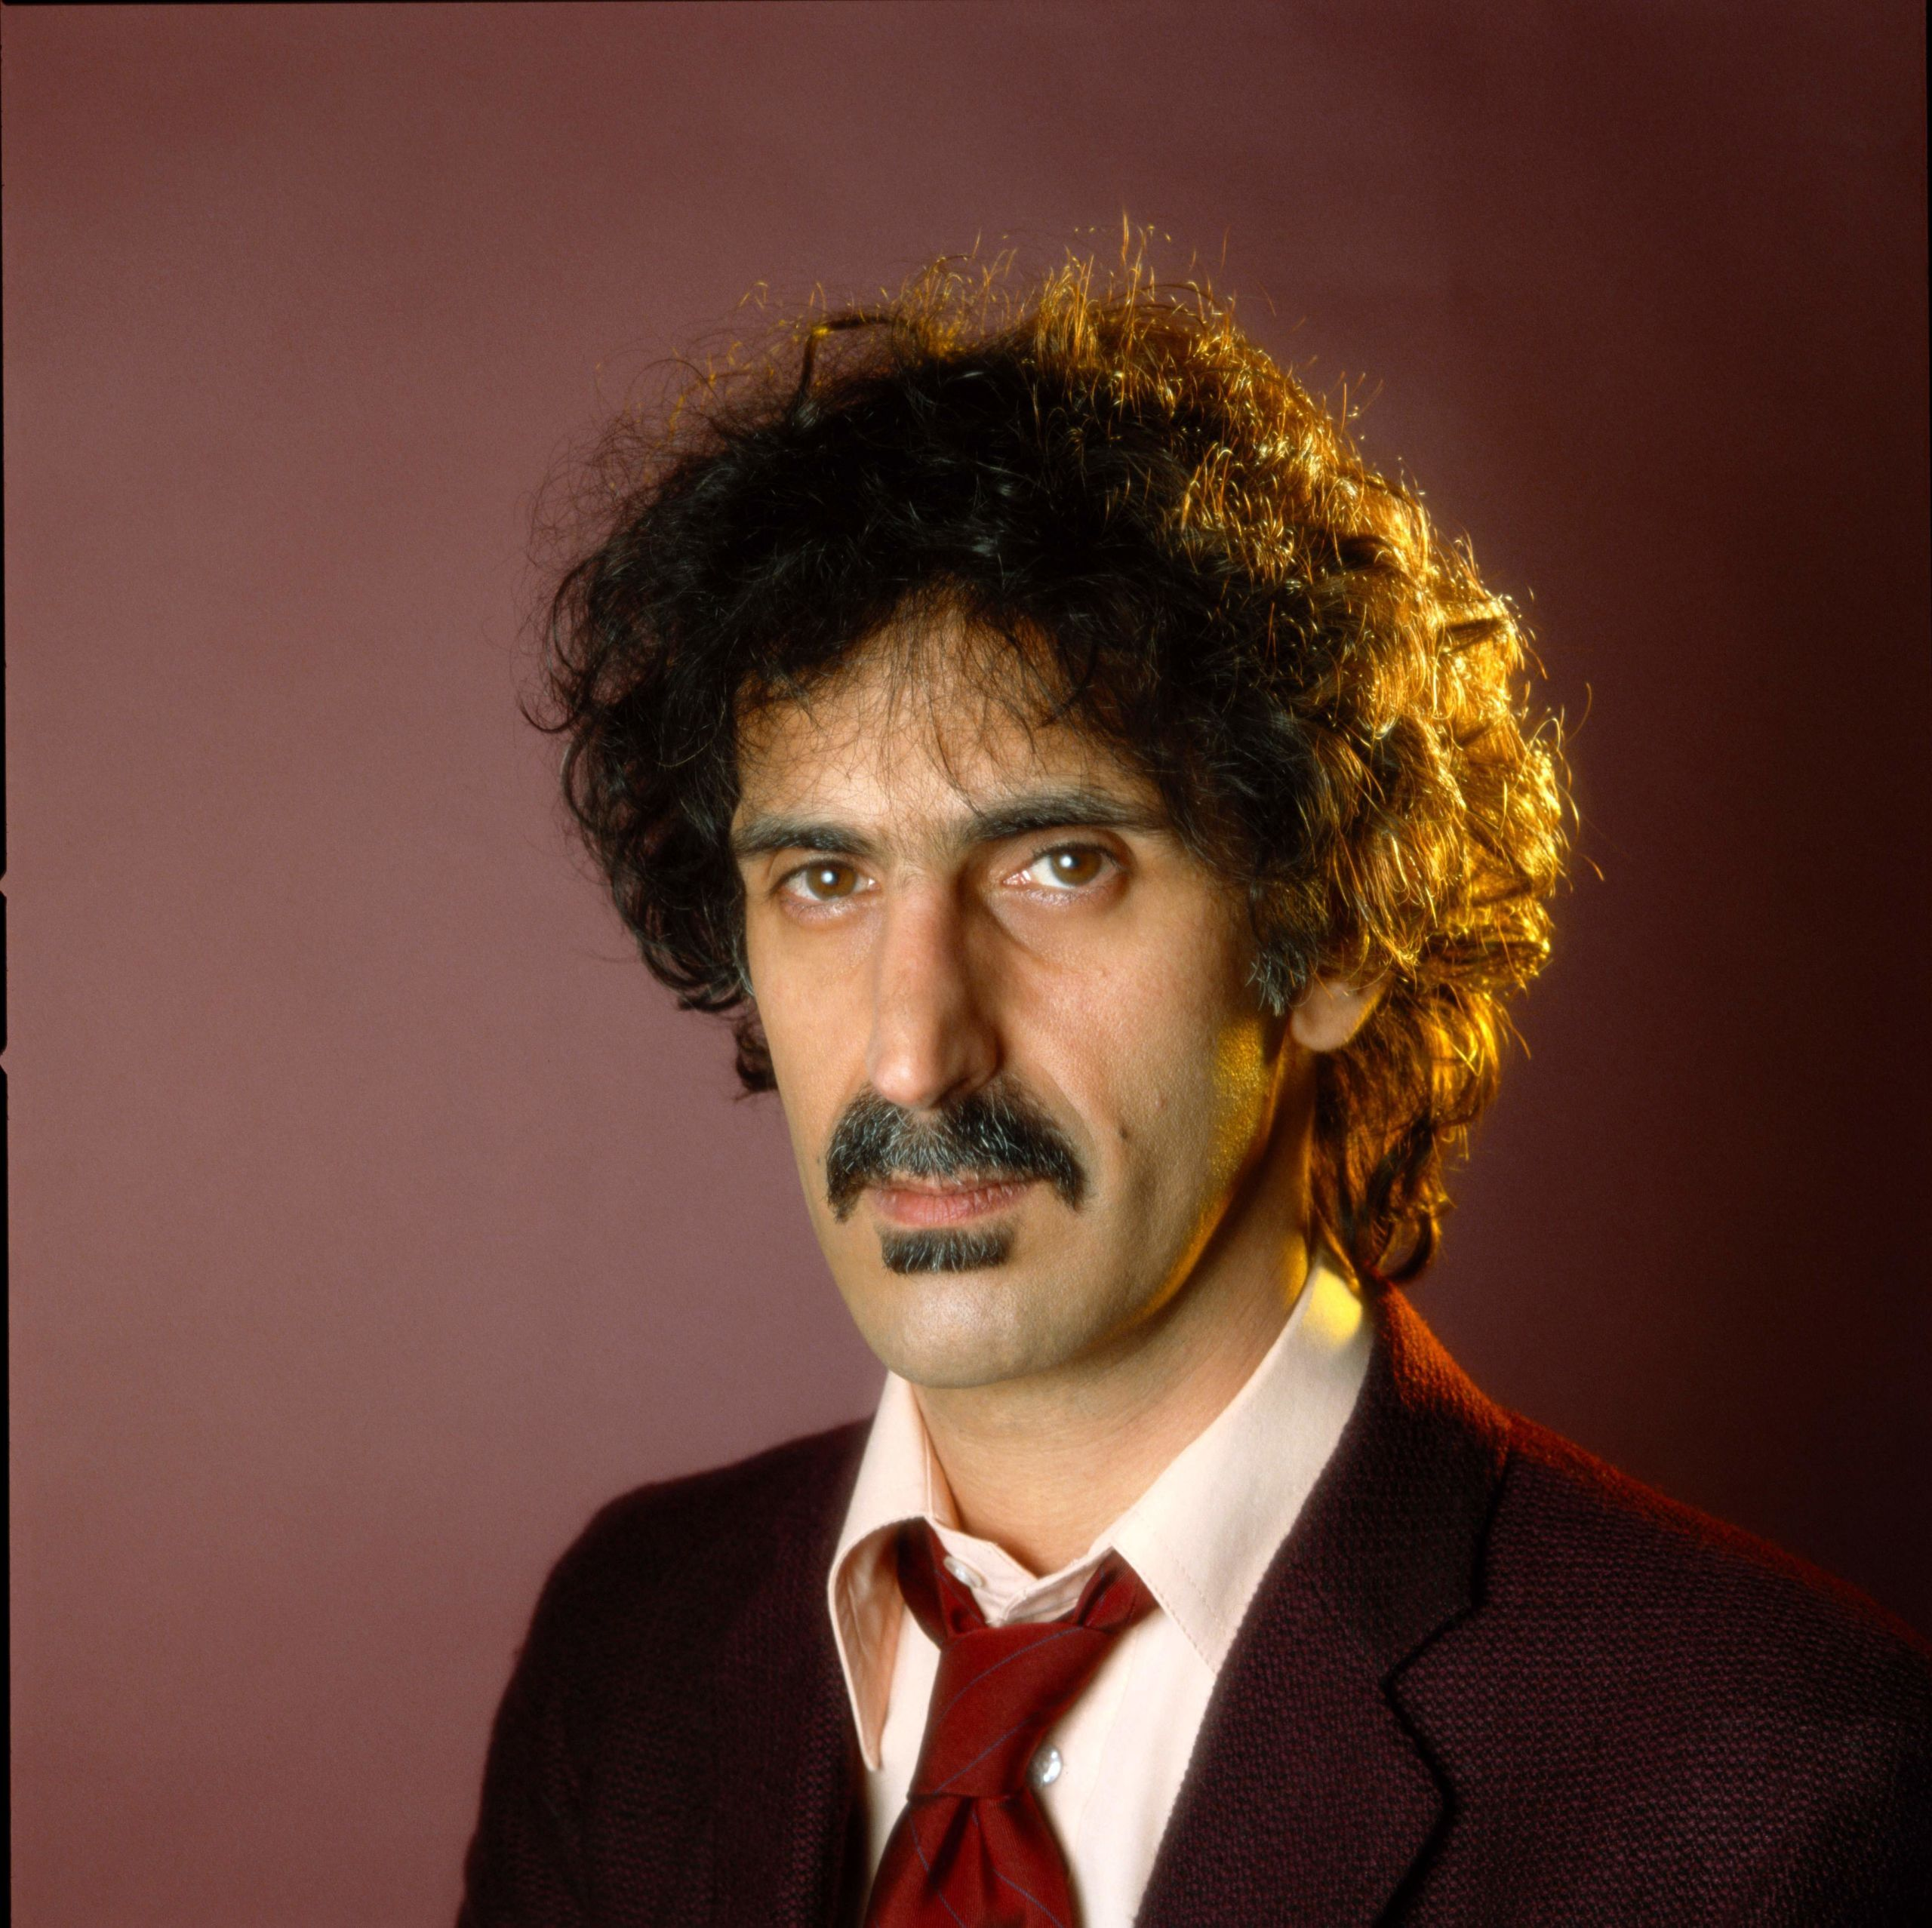 Frank Zappa Happy Birthday with frank-zappa-9540382-2-raw | frank zappa & the mothers of invention